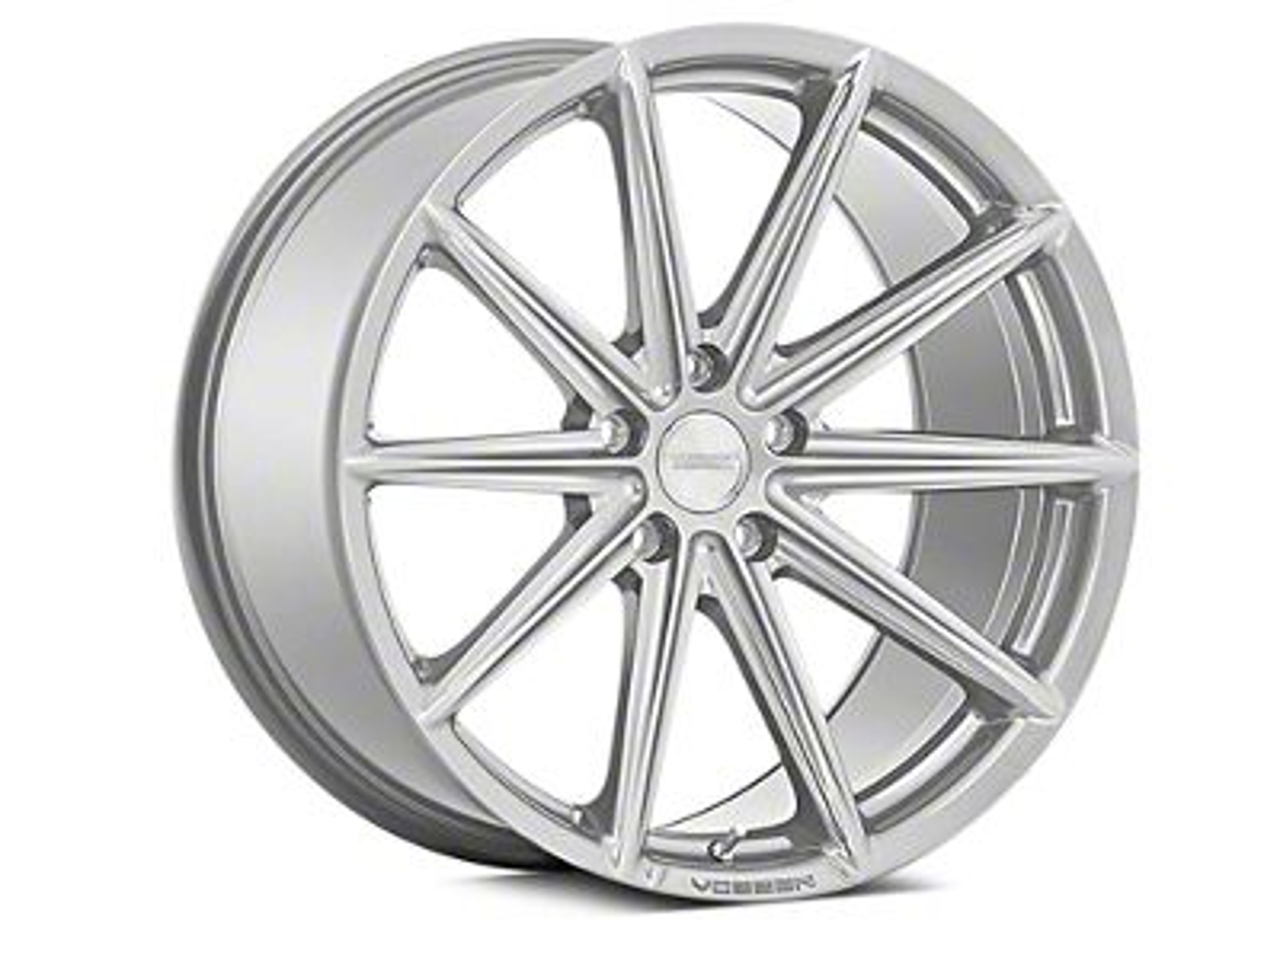 Vossen VFS-10 Silver Metallic Wheel - 20x10.5 - Rear Only (15-19 All)